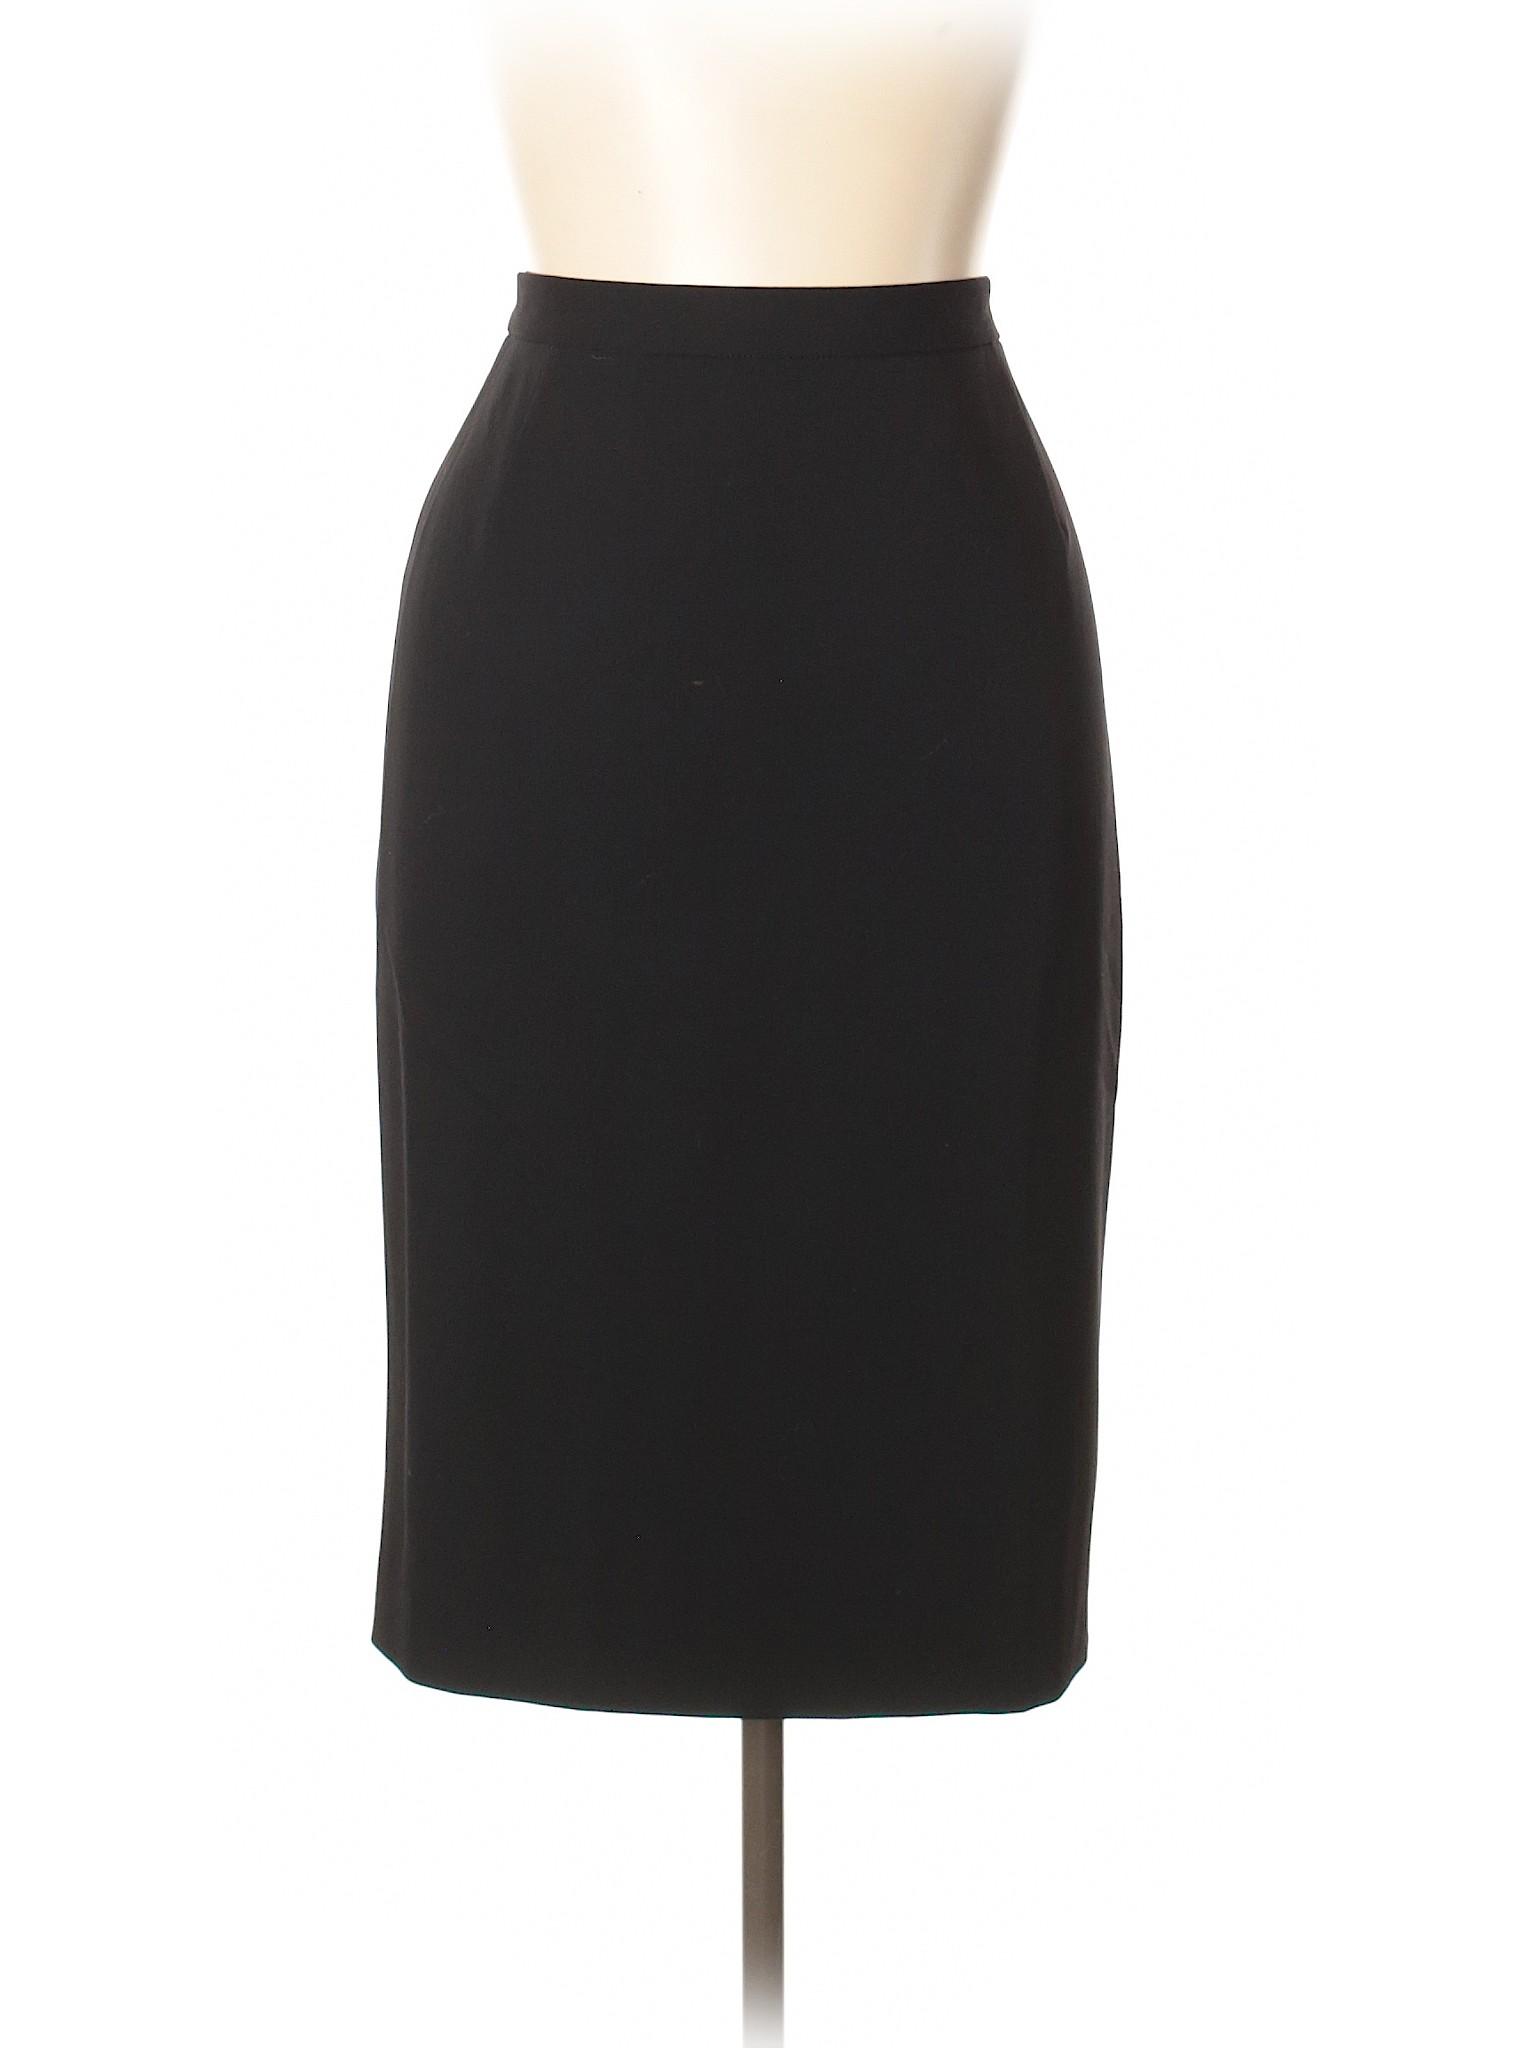 Skirt Boutique Wool Skirt Skirt Boutique Wool Boutique Wool Boutique qwEYzAAv